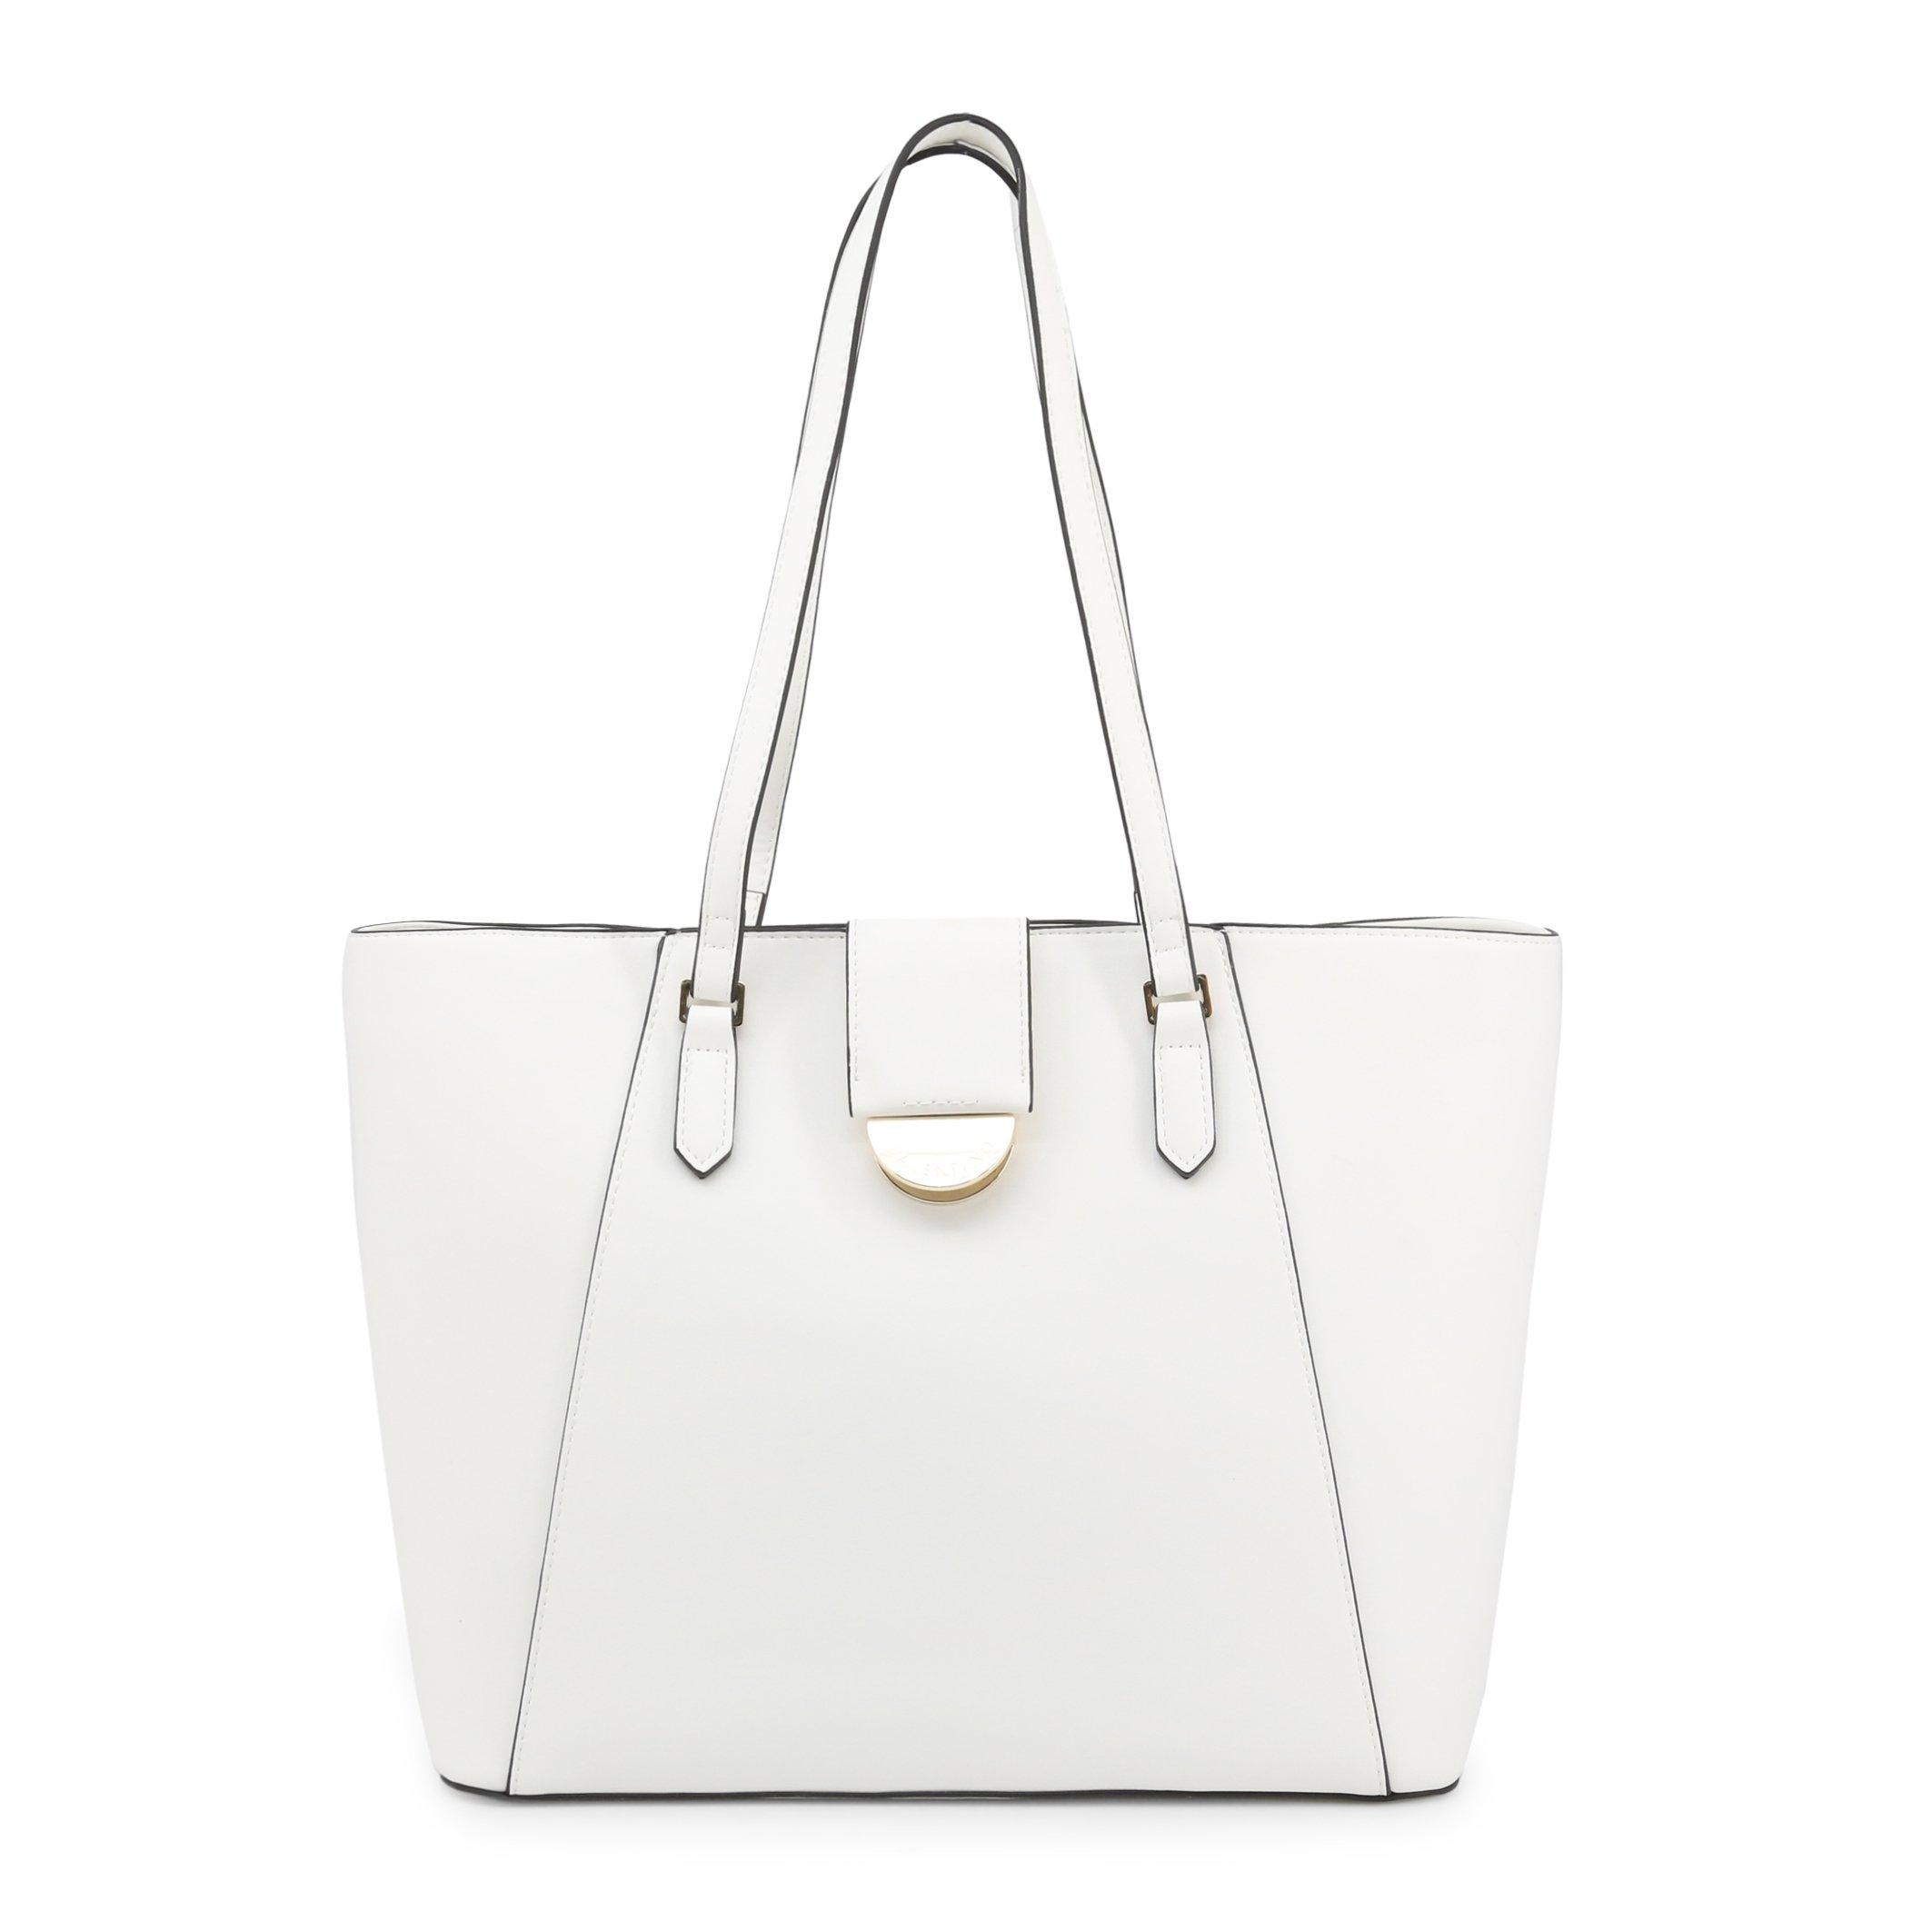 Valentino by Mario Valentino Women's Shopping Bag Various Colours FALCOR-VBS3TP01 - white NOSIZE